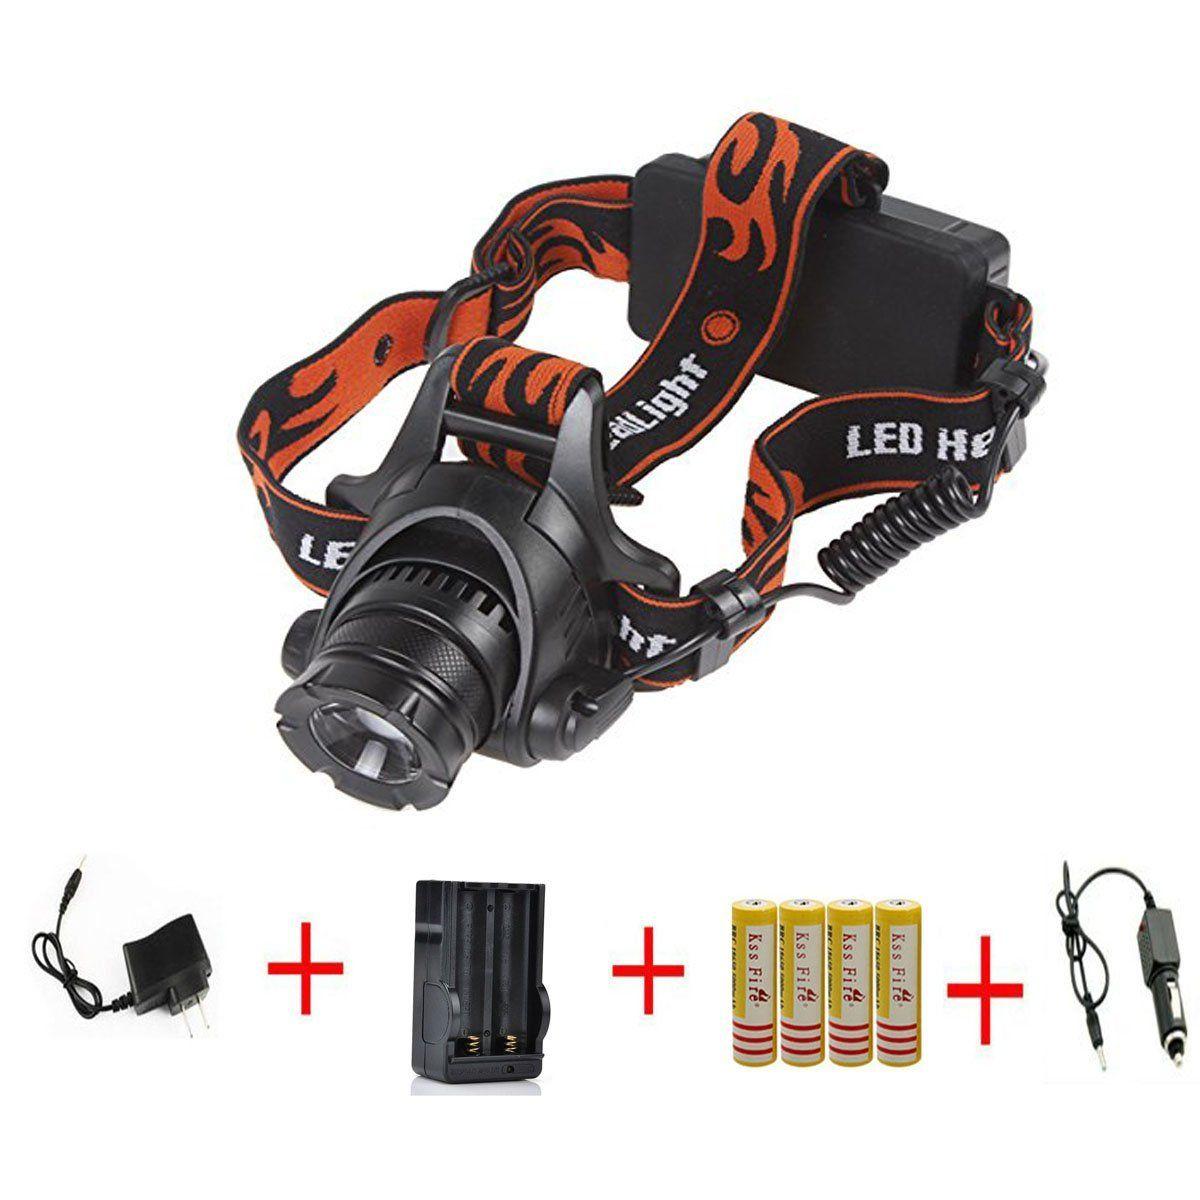 Kssfire Zoomable 1800 Lumens Cree Xm L T6 U2 Led Waterproof 3 Modes High Power Headlamp 5000 Black